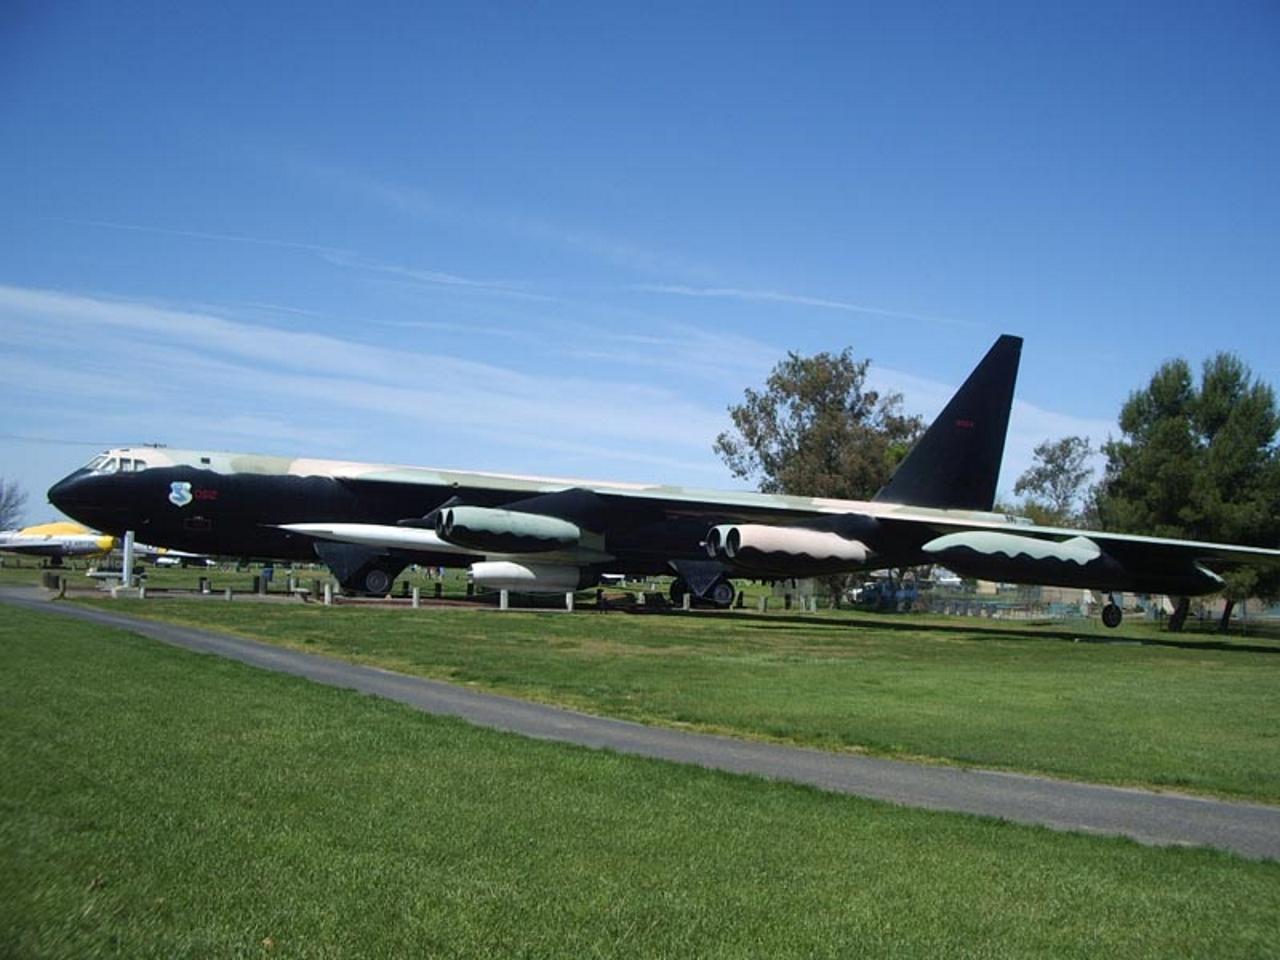 Boeing B-52D-80-BO Stratofortress